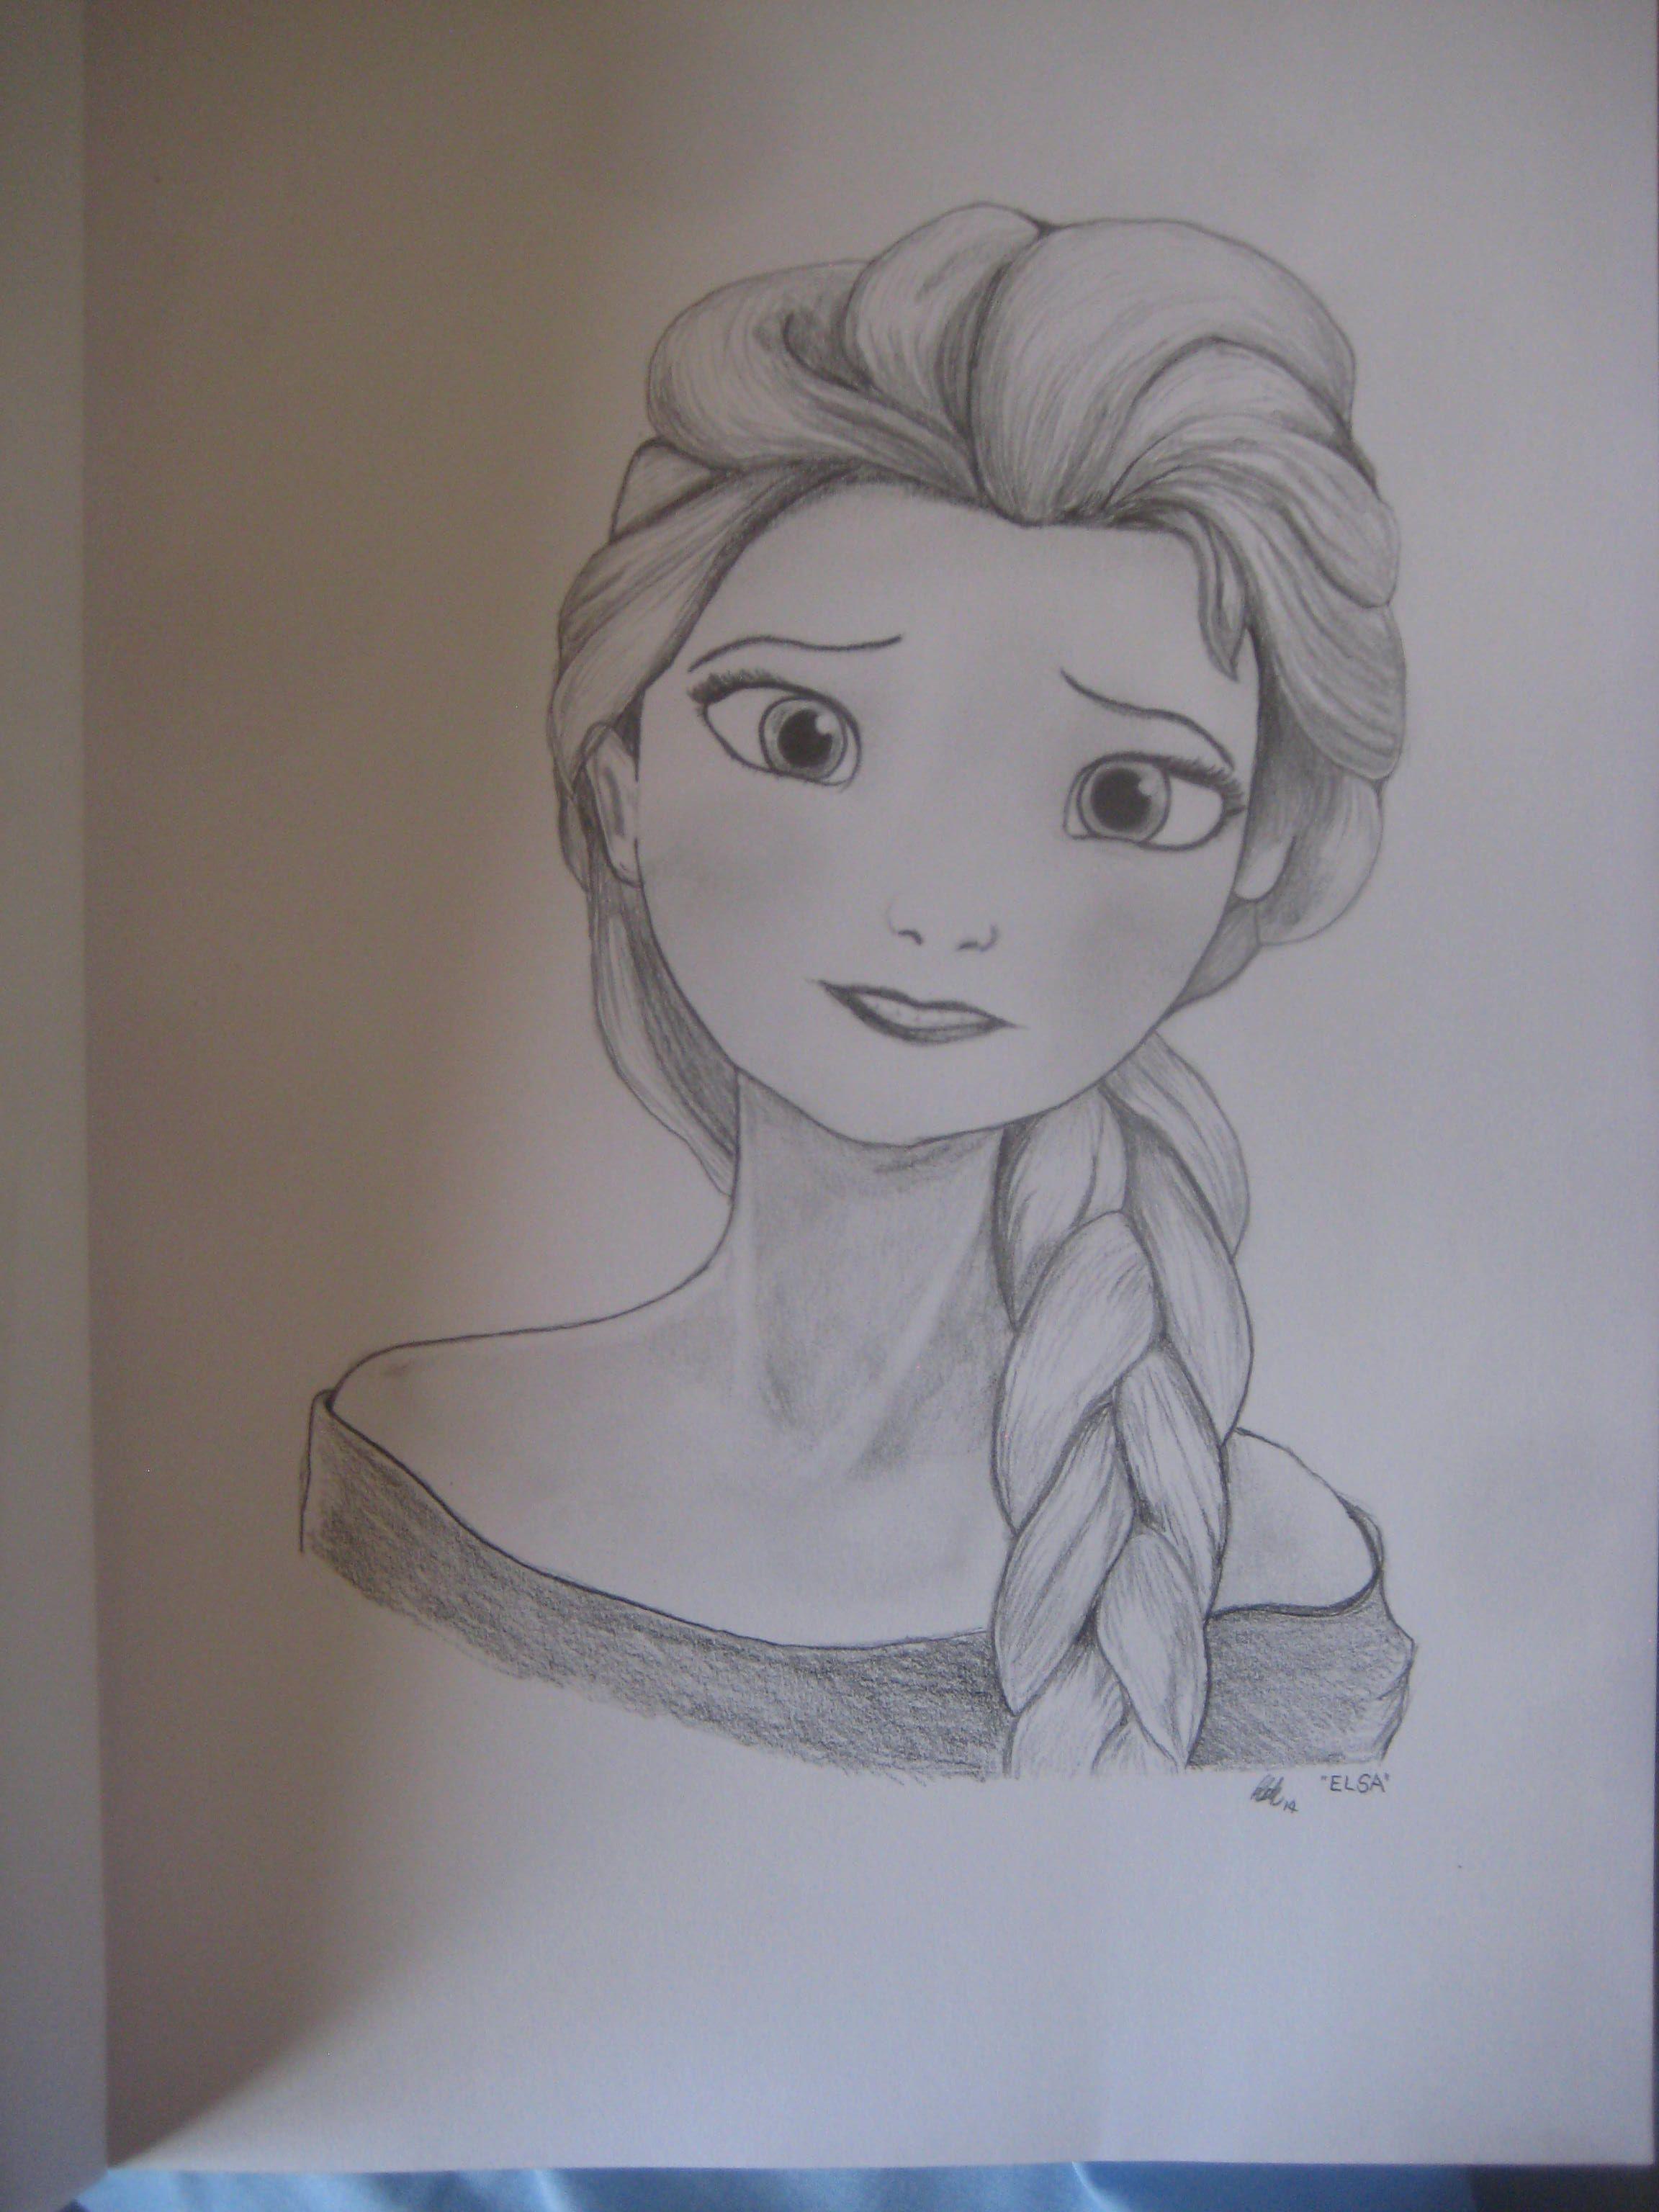 Elsa from frozen pencil drawing drawing drawings pencil